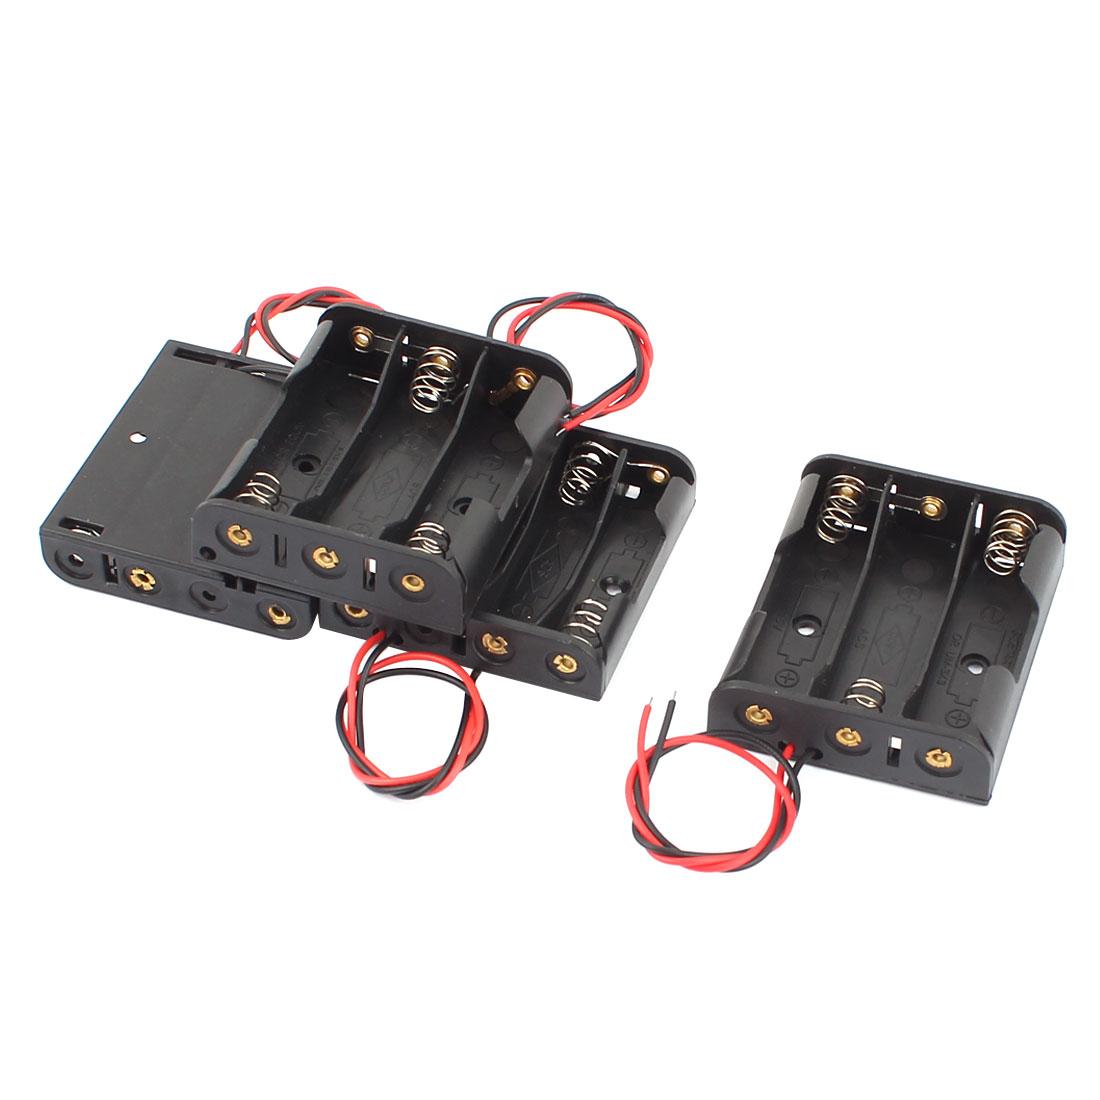 4 Pcs Wire Lead 3x1.5V AA 4x1.5V AAA Battery Case Holder Box Black